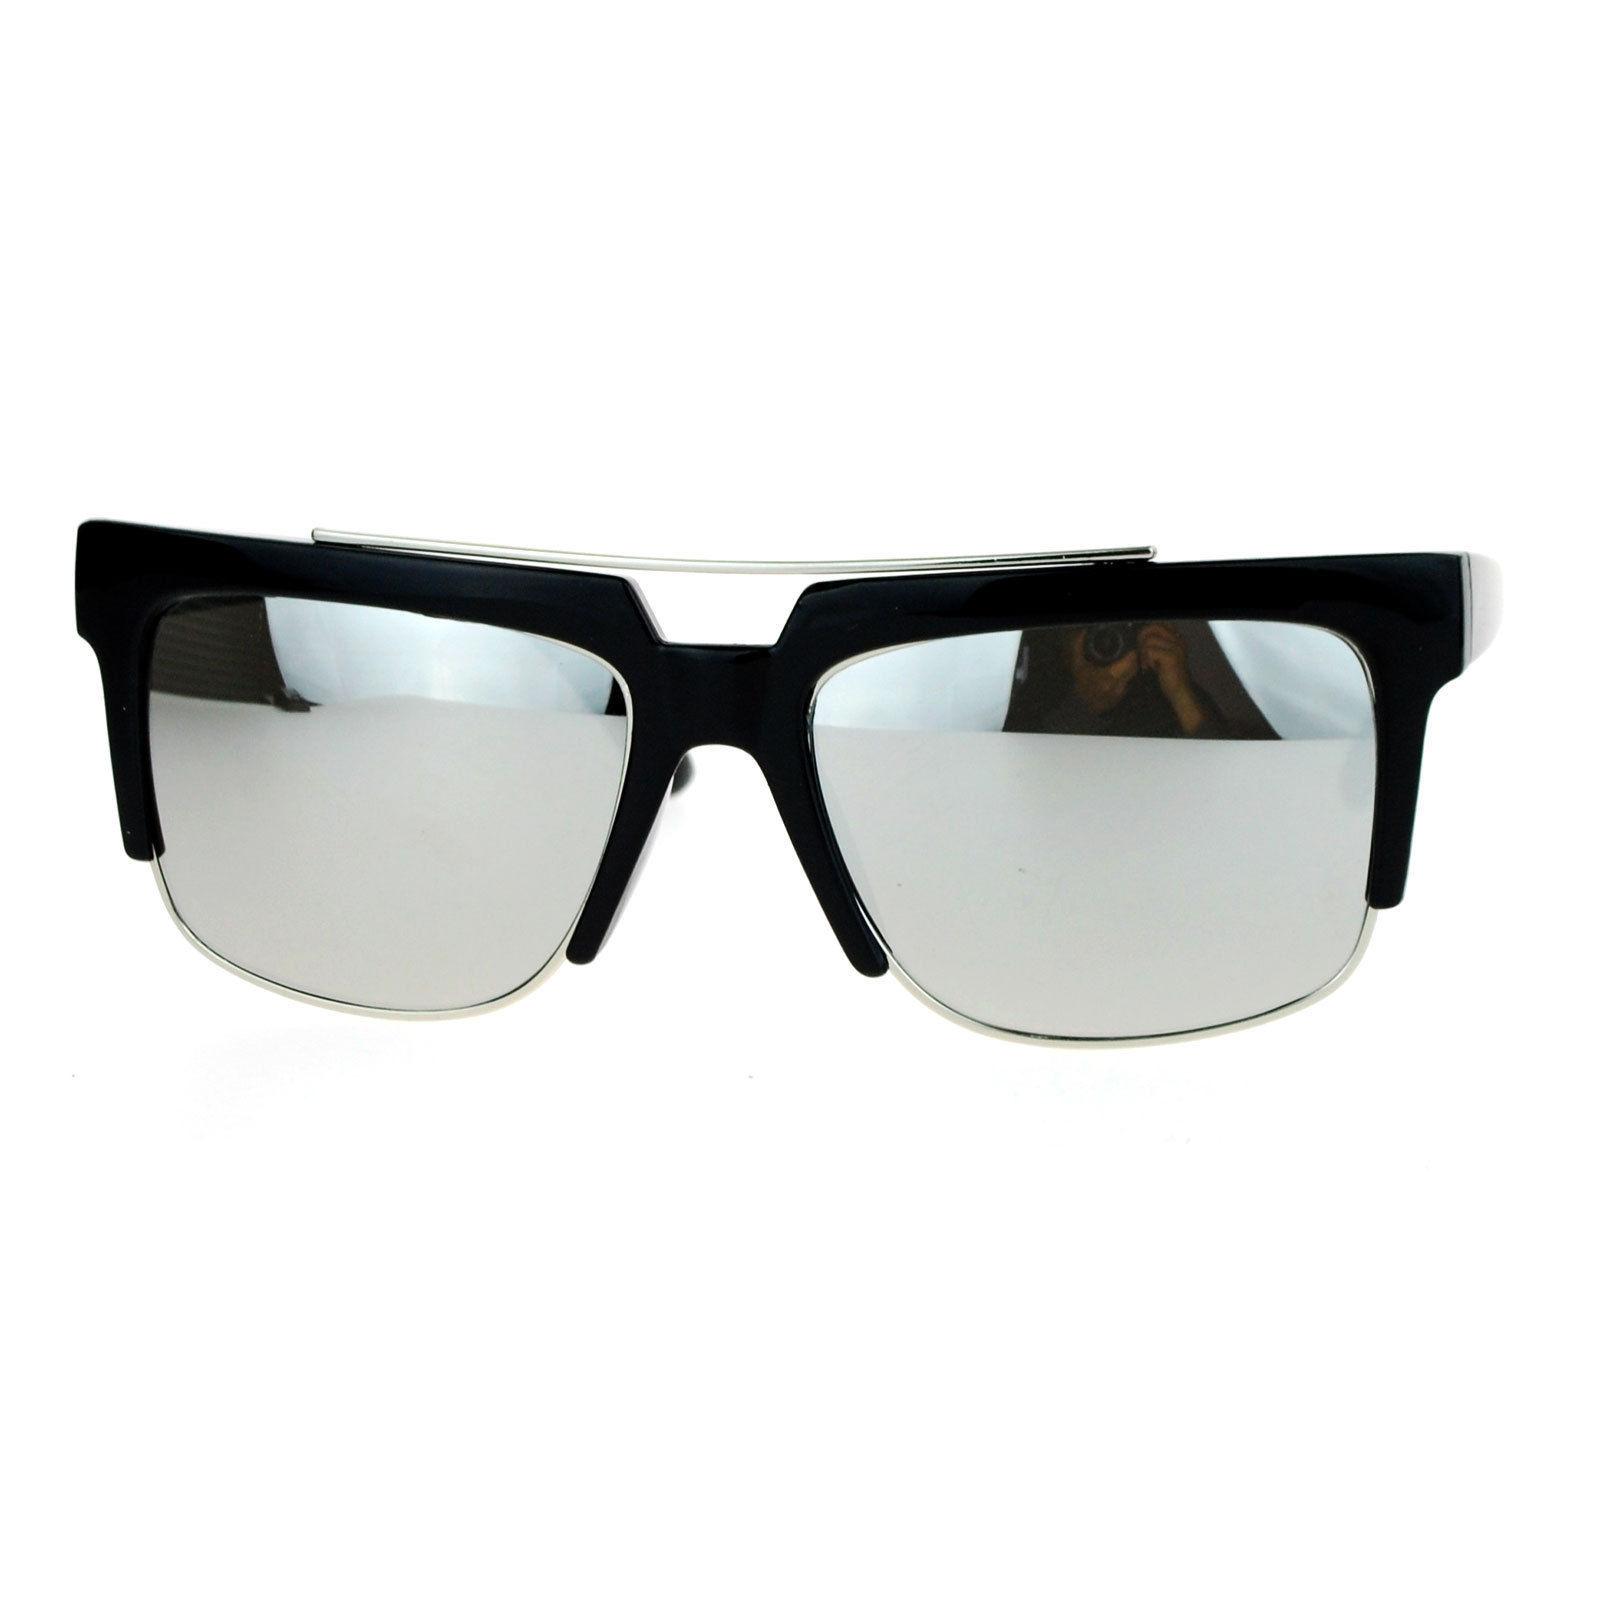 Unisex Fashion Sunglasses Square Flat Top Designer Style Shades UV 400